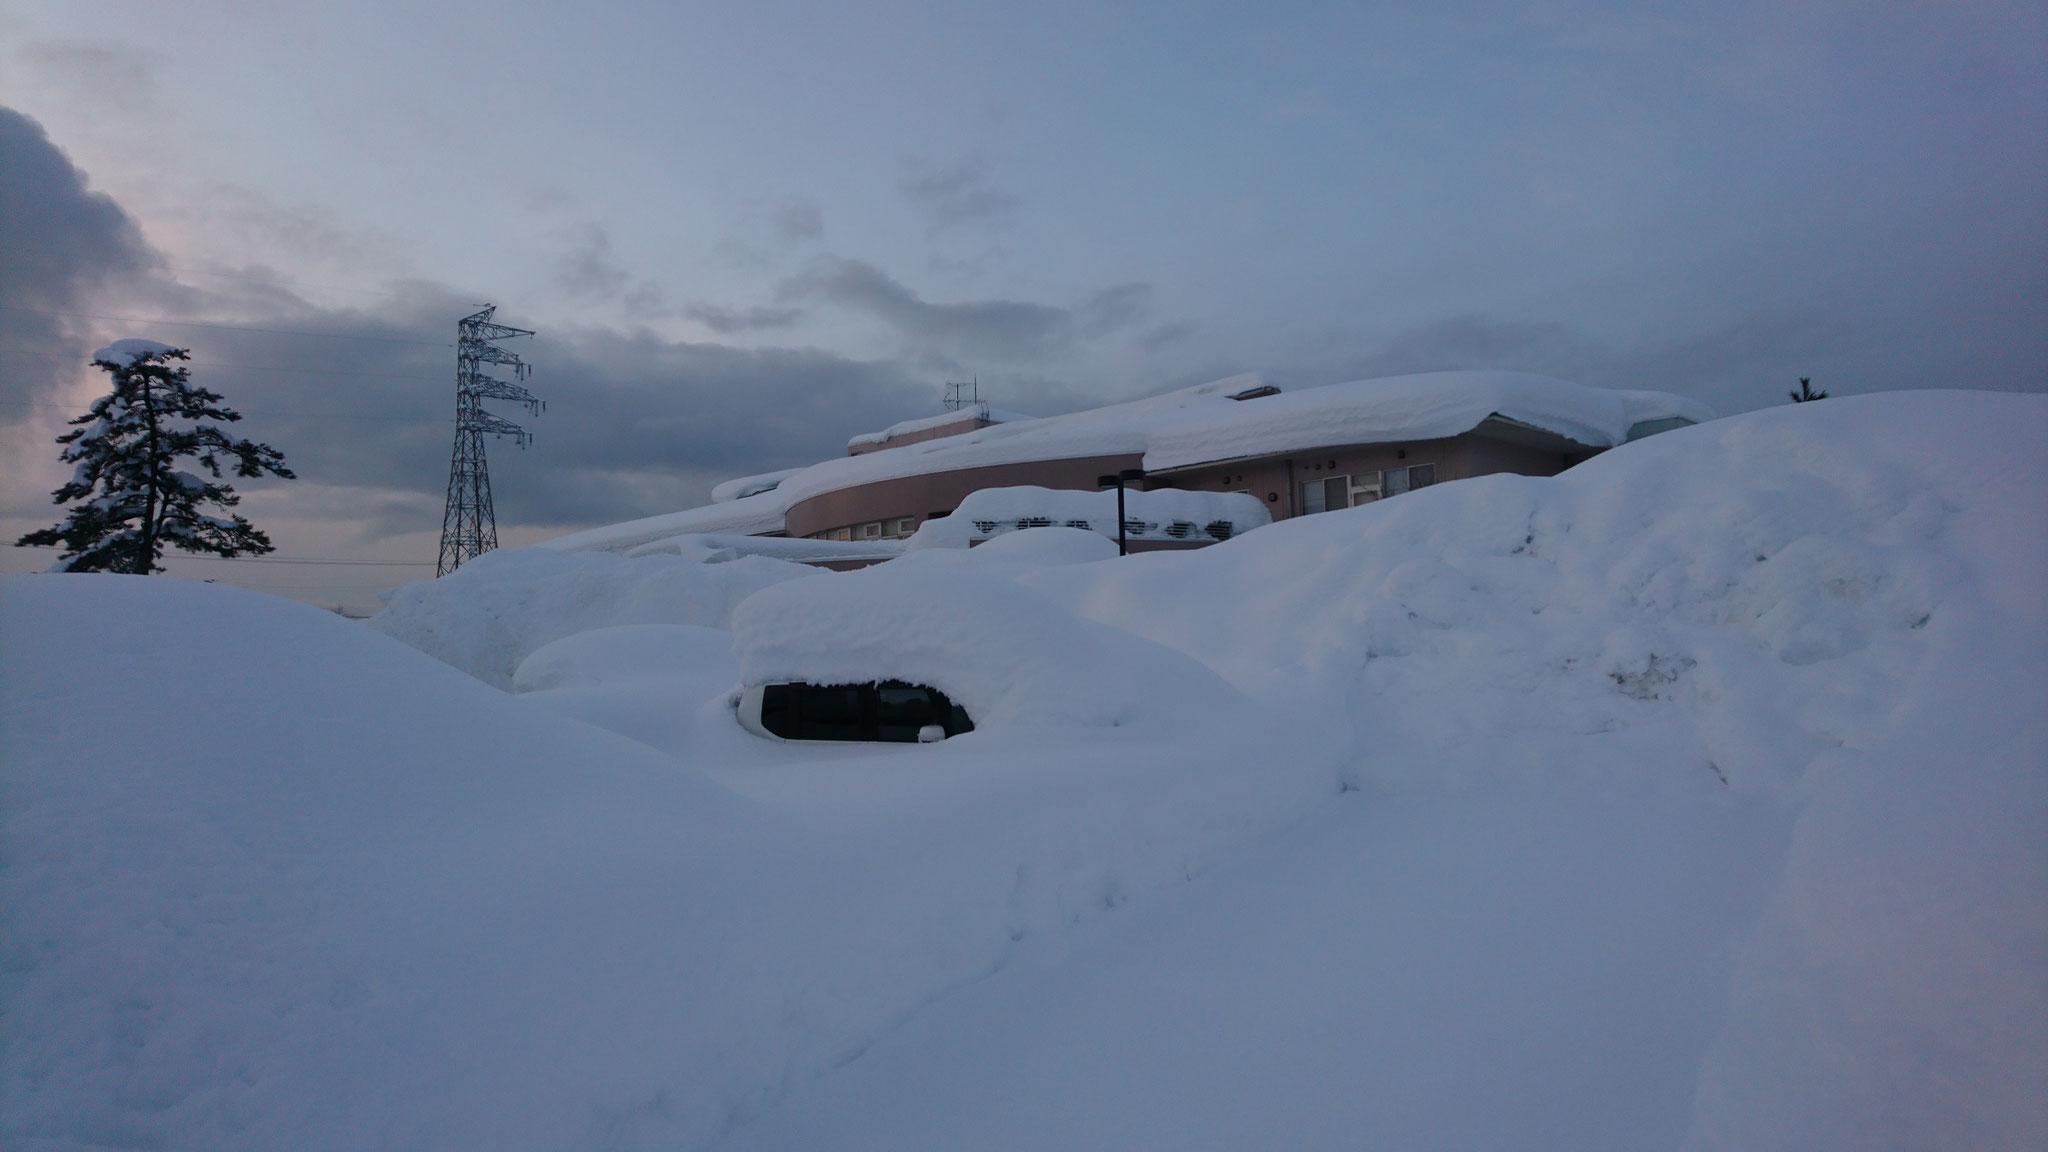 【before】雪に埋め尽くされた駐車場